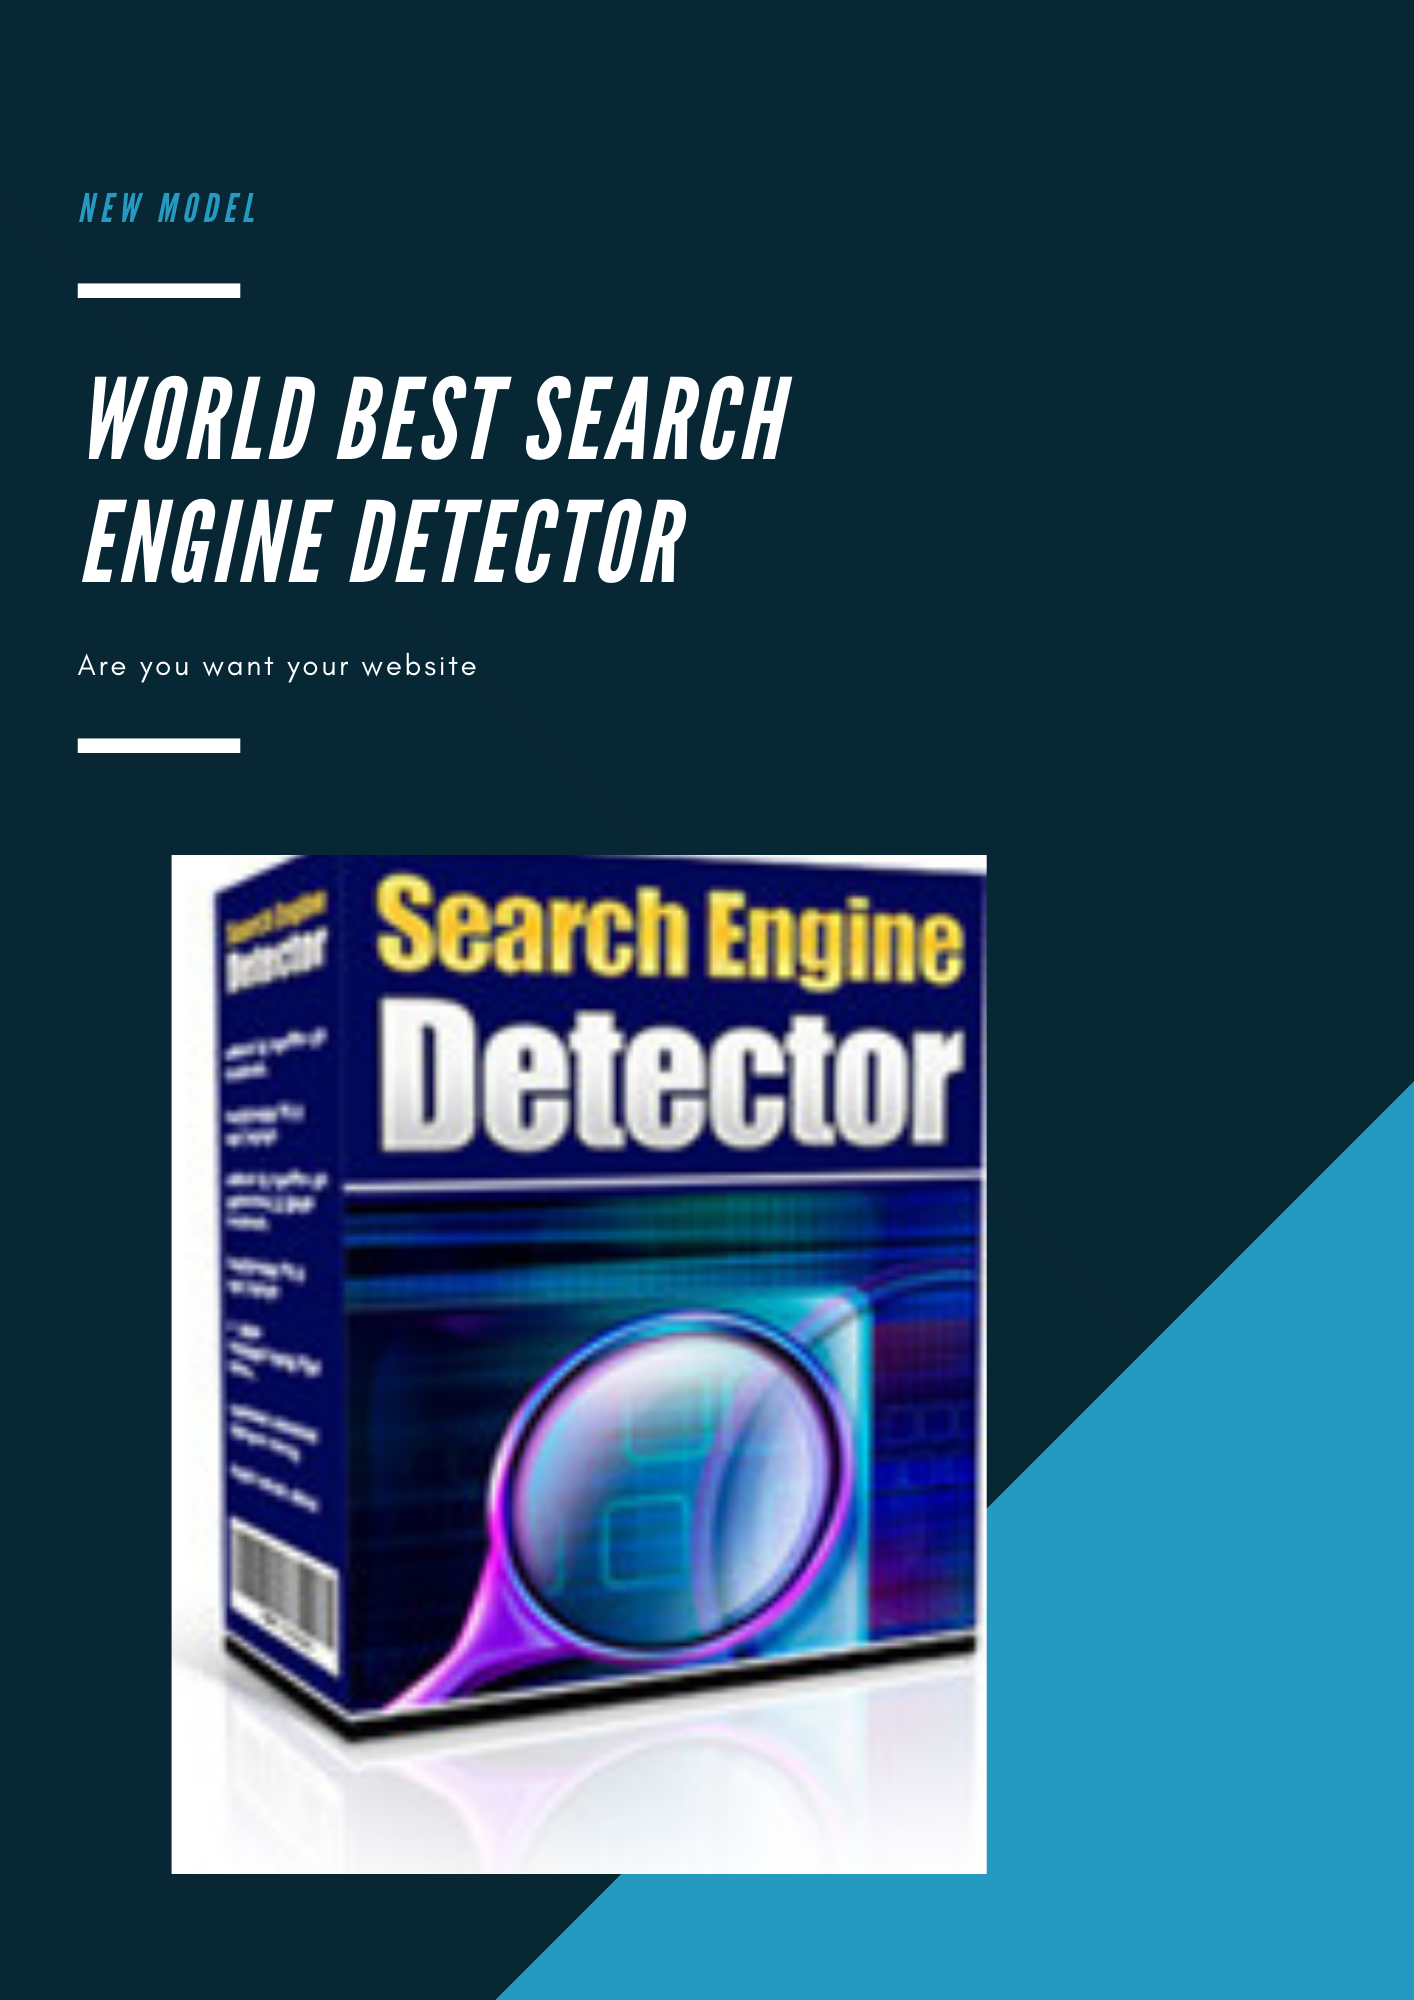 World best search engine software